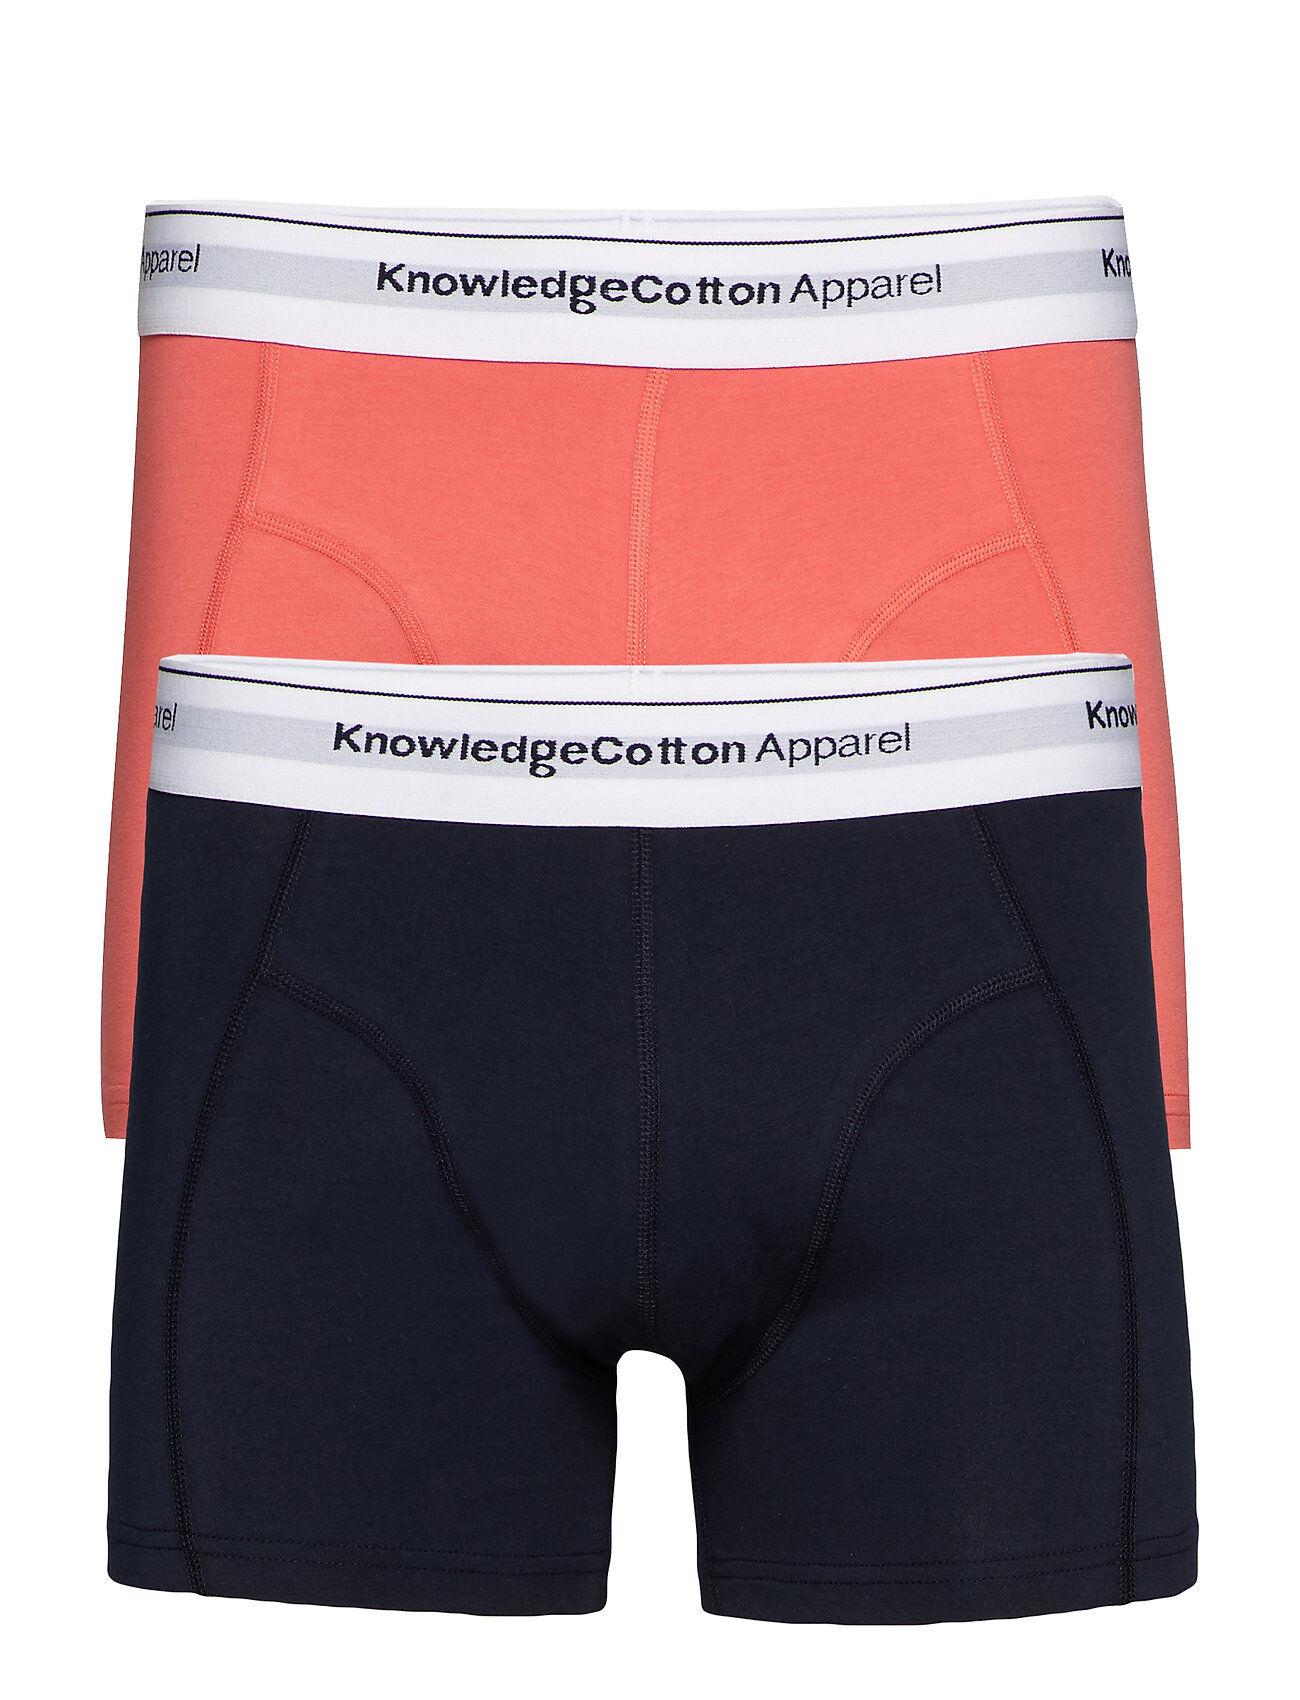 Knowledge Cotton Apparel 2 Pack Underwear - Season - Gots/Ve